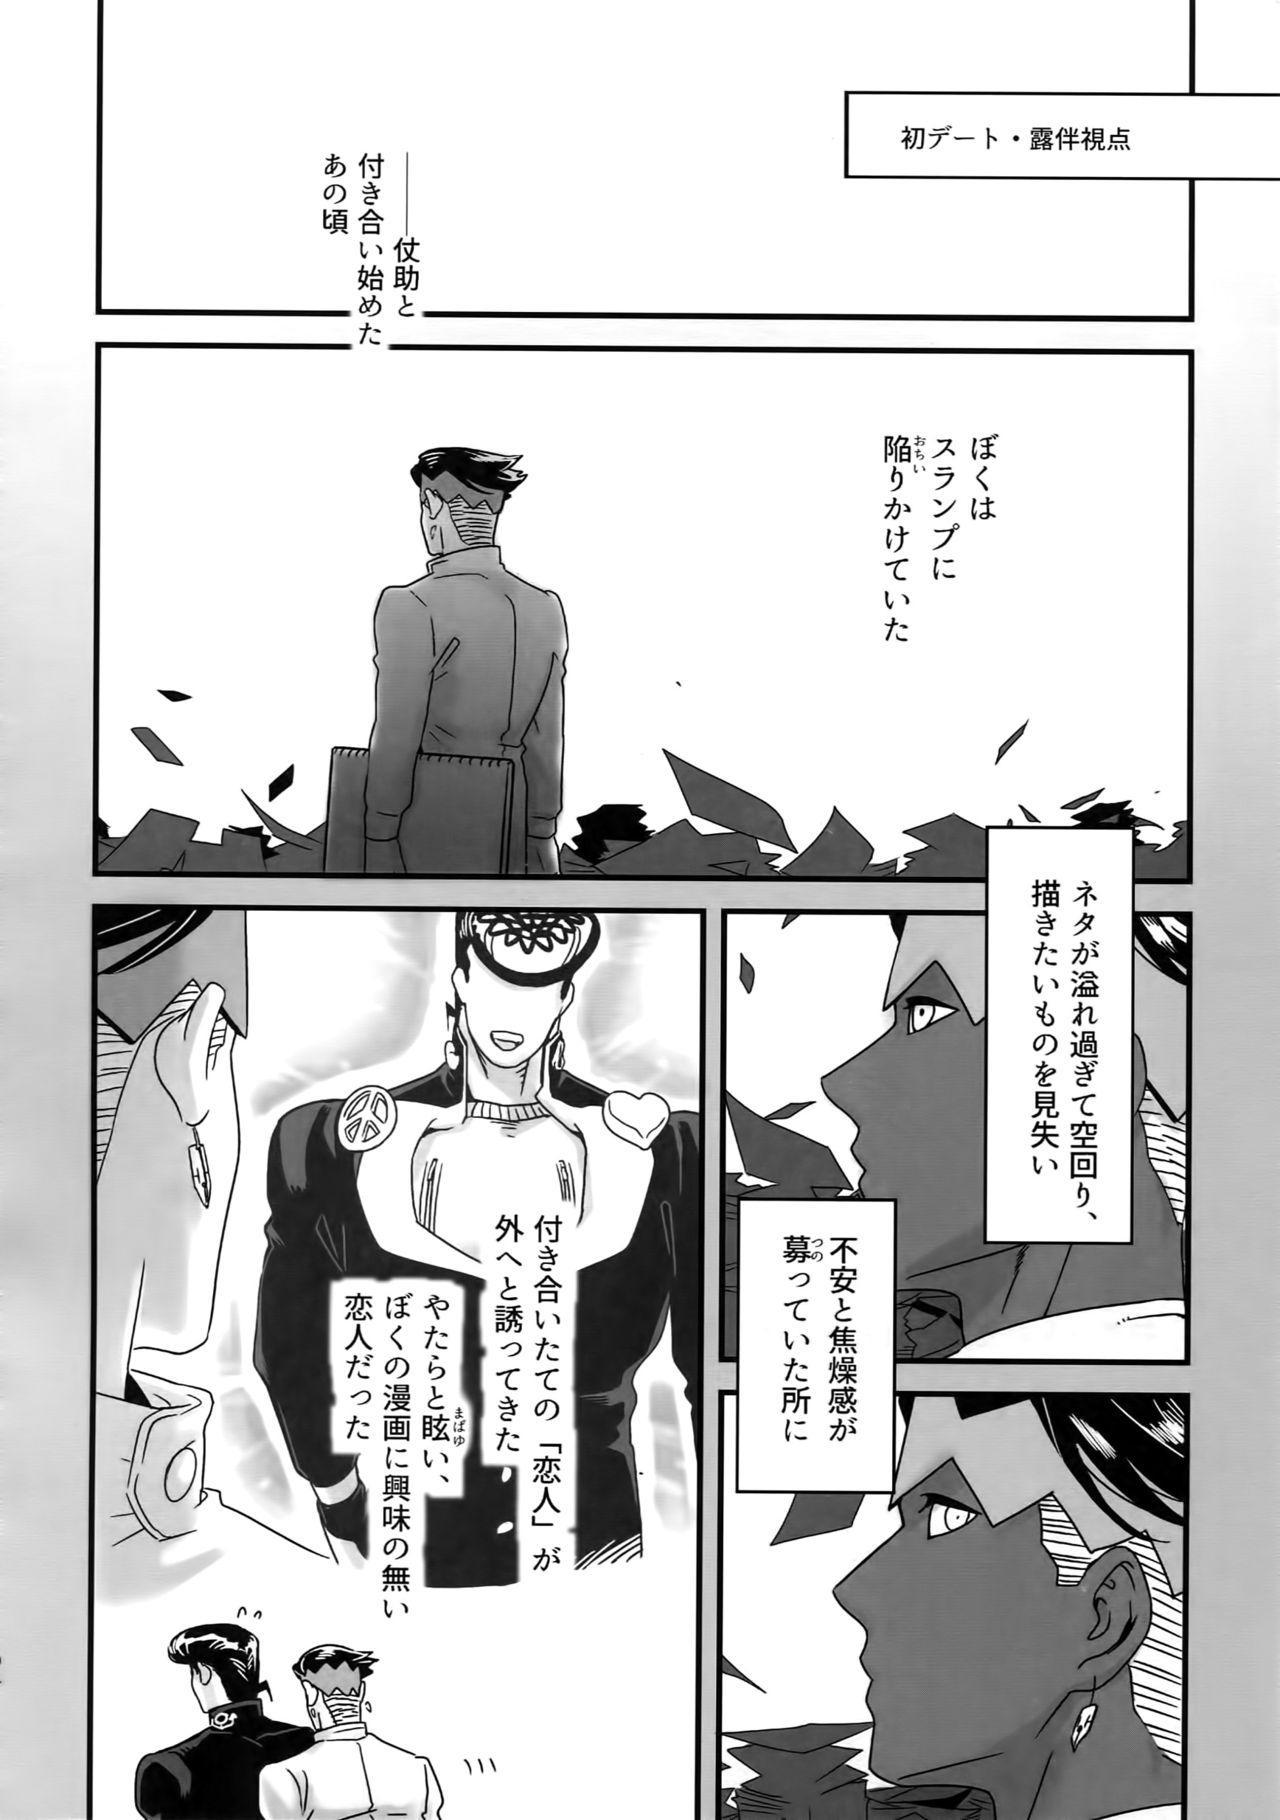 NuruNuru JoRo Sairokubon 92